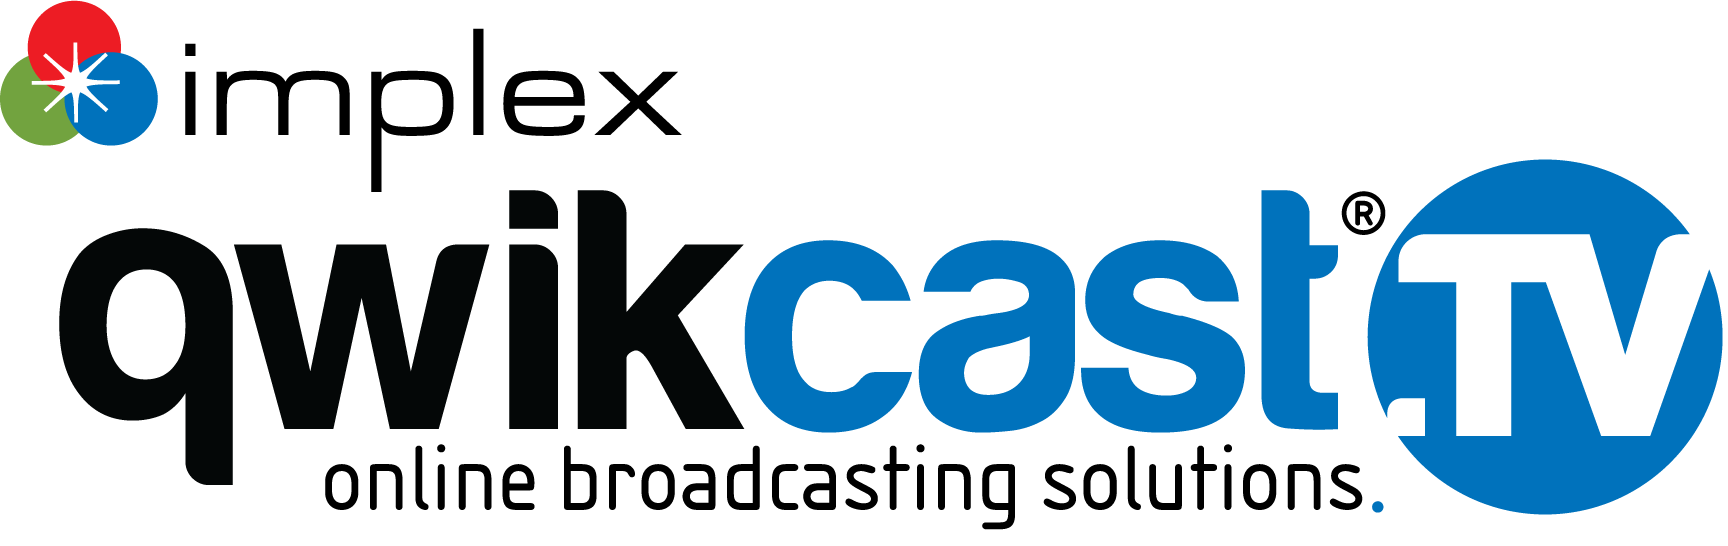 Qwikcast Logo